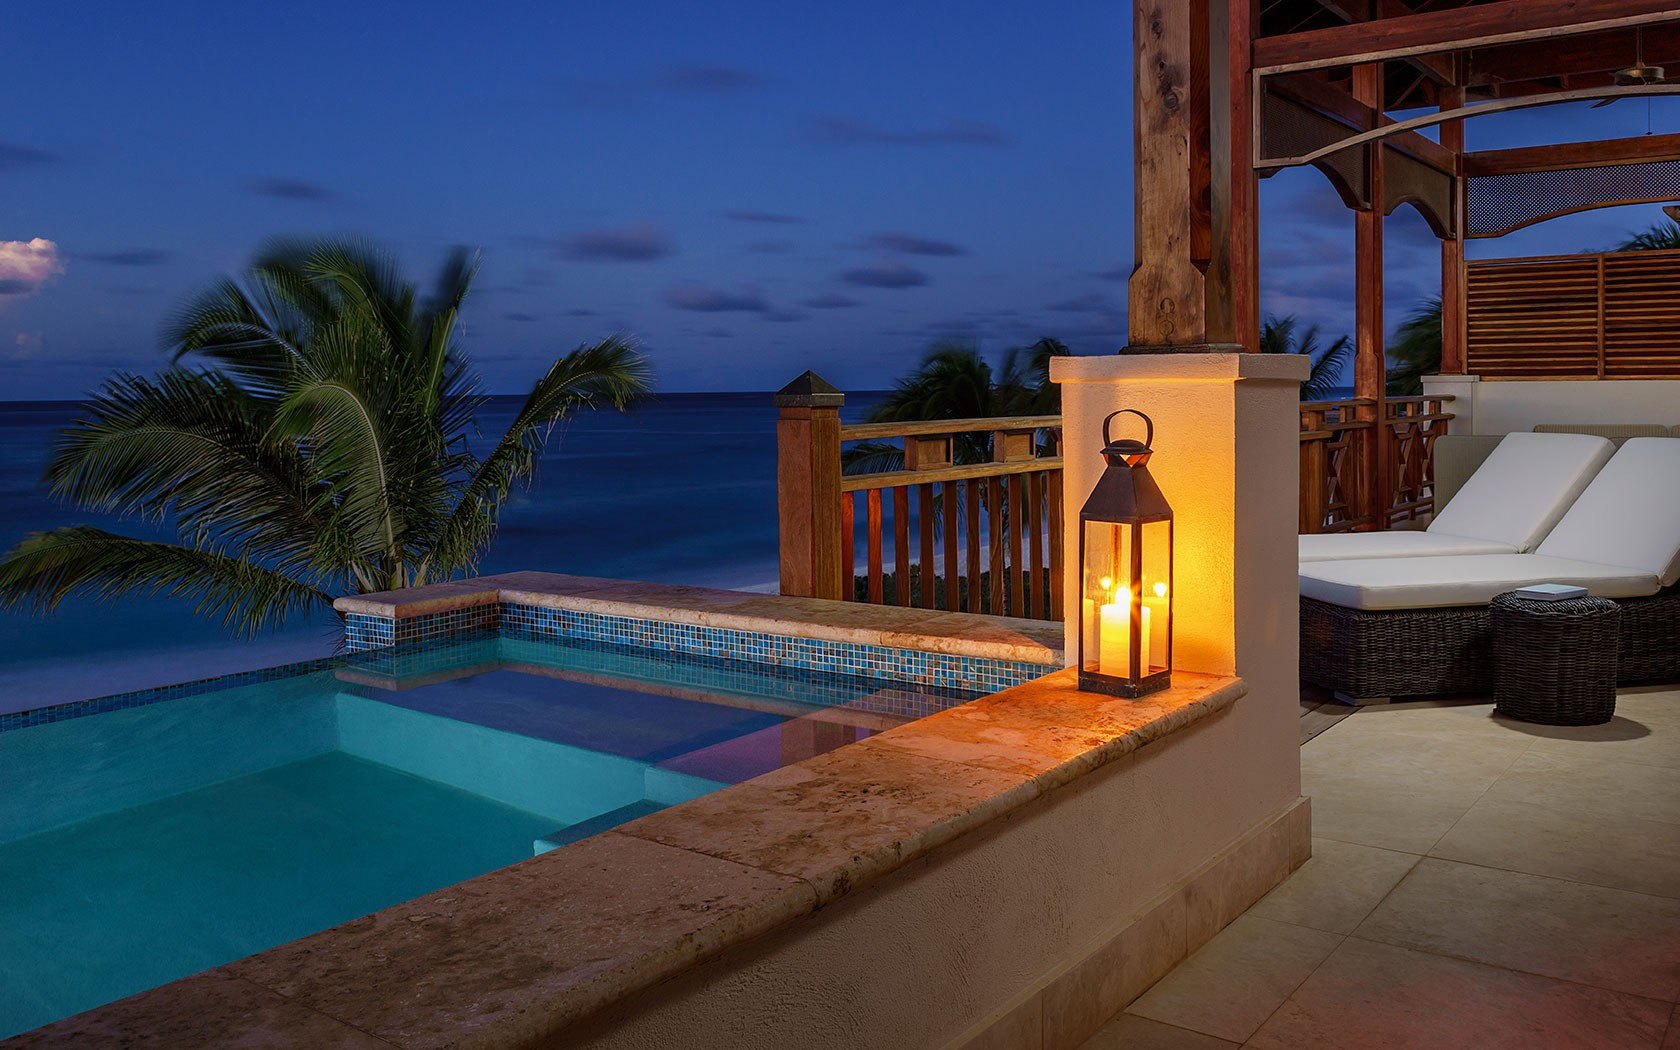 Villa In Shoal Bay Zemi Beach 3 Bedroom Beachfront Residence